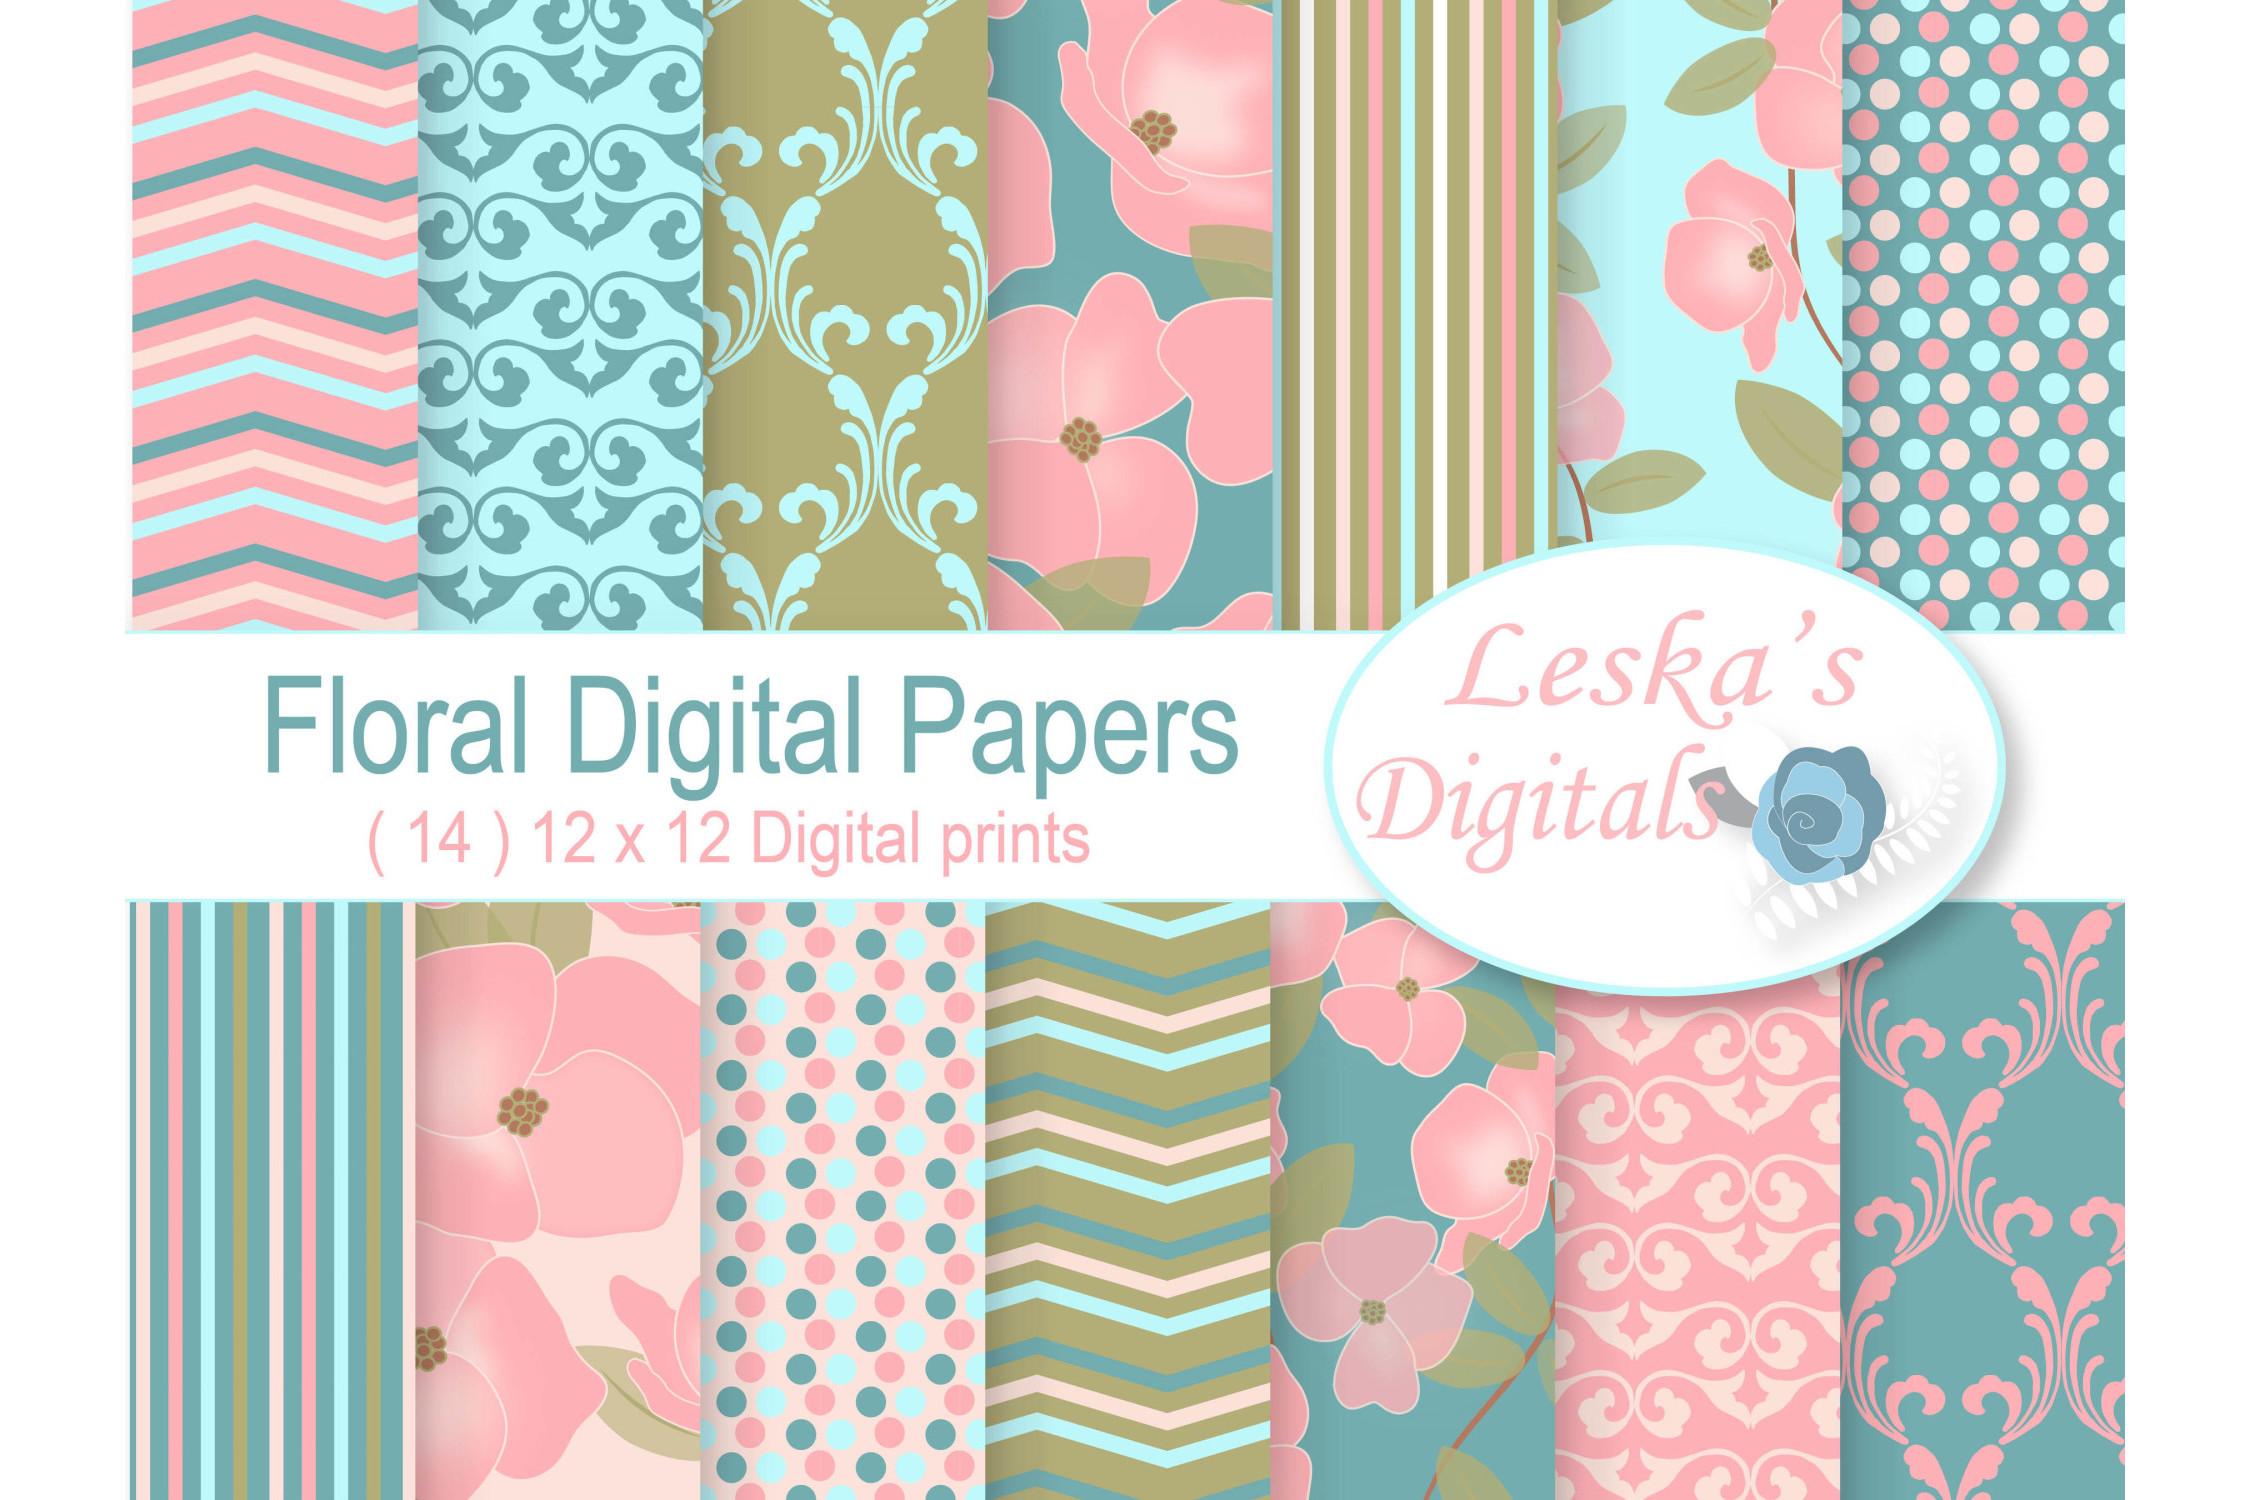 Floral Digital Paper example image 1